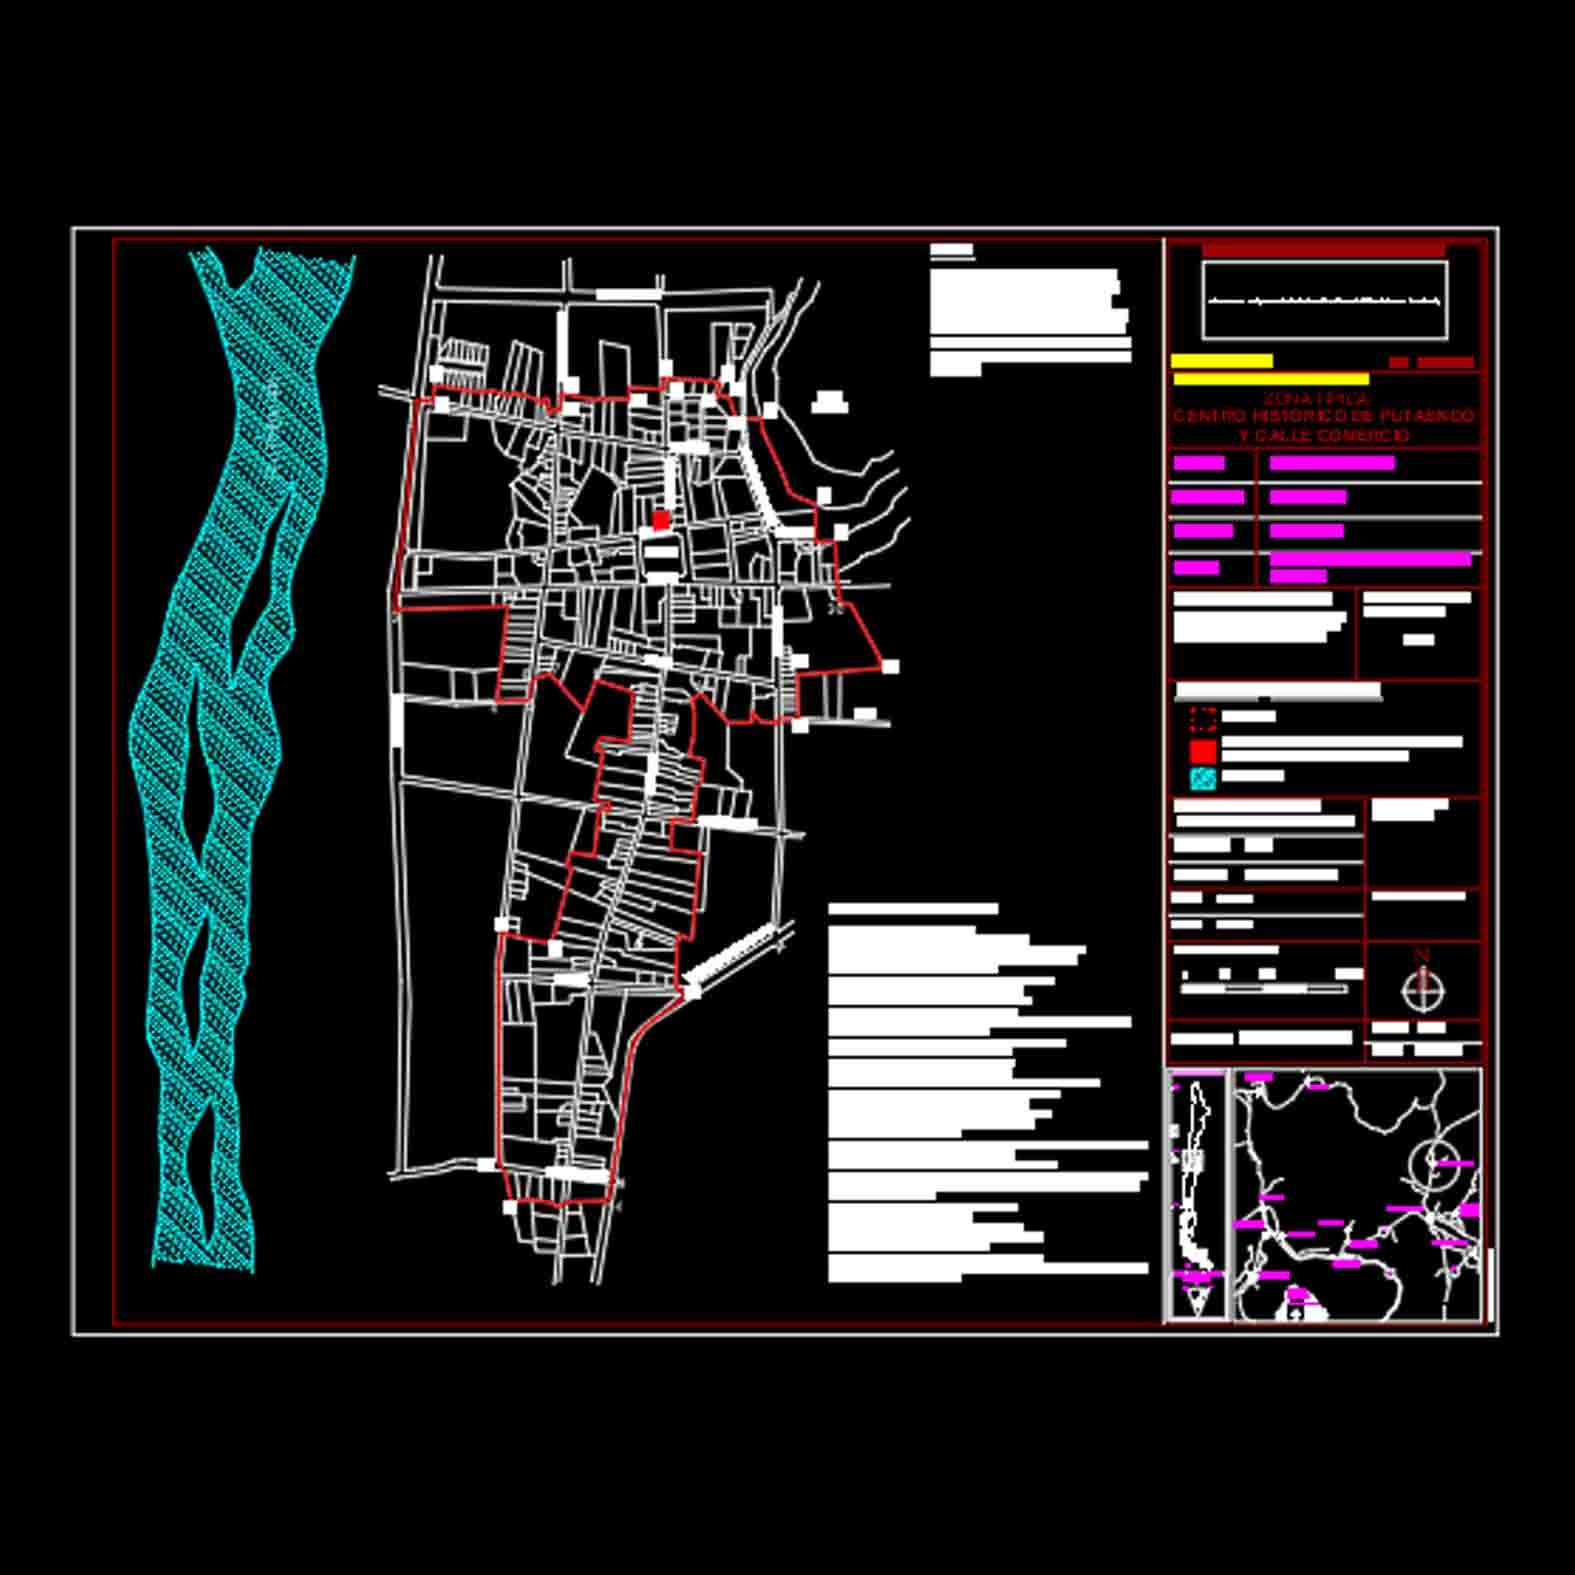 Plano: Calle Comercio de Putaendo / Zona Típica